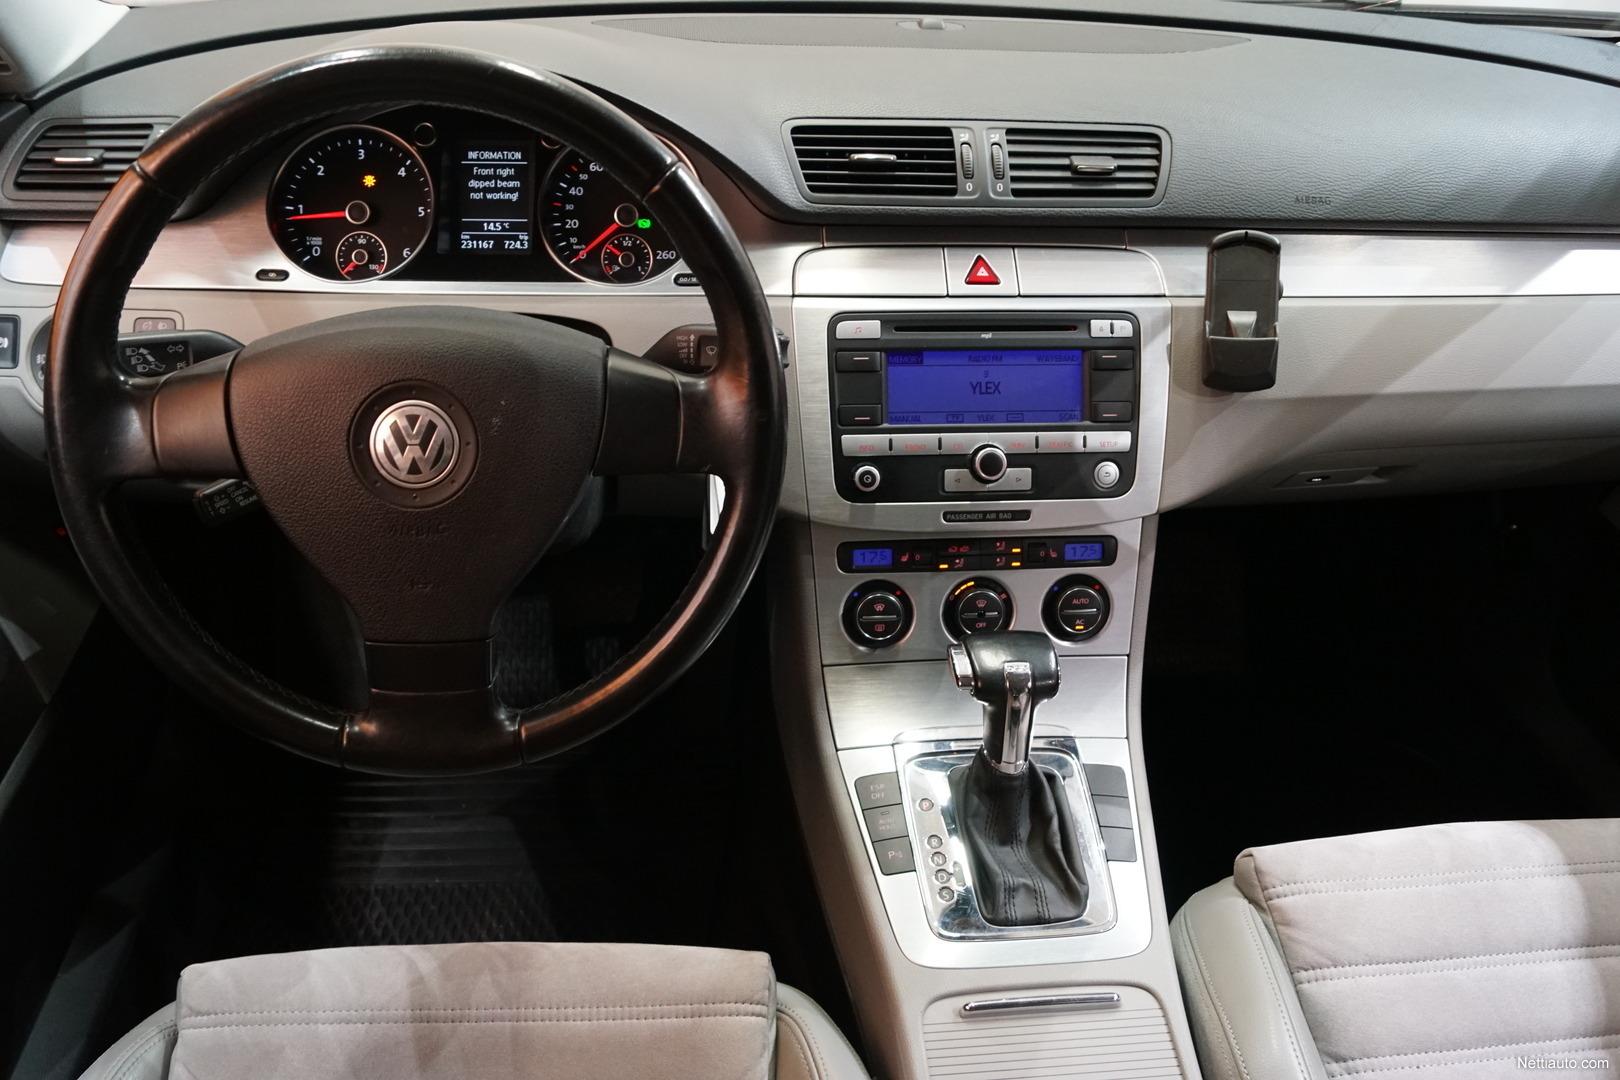 Front Left Dipped Beam Not Working Volkswagen Cc New